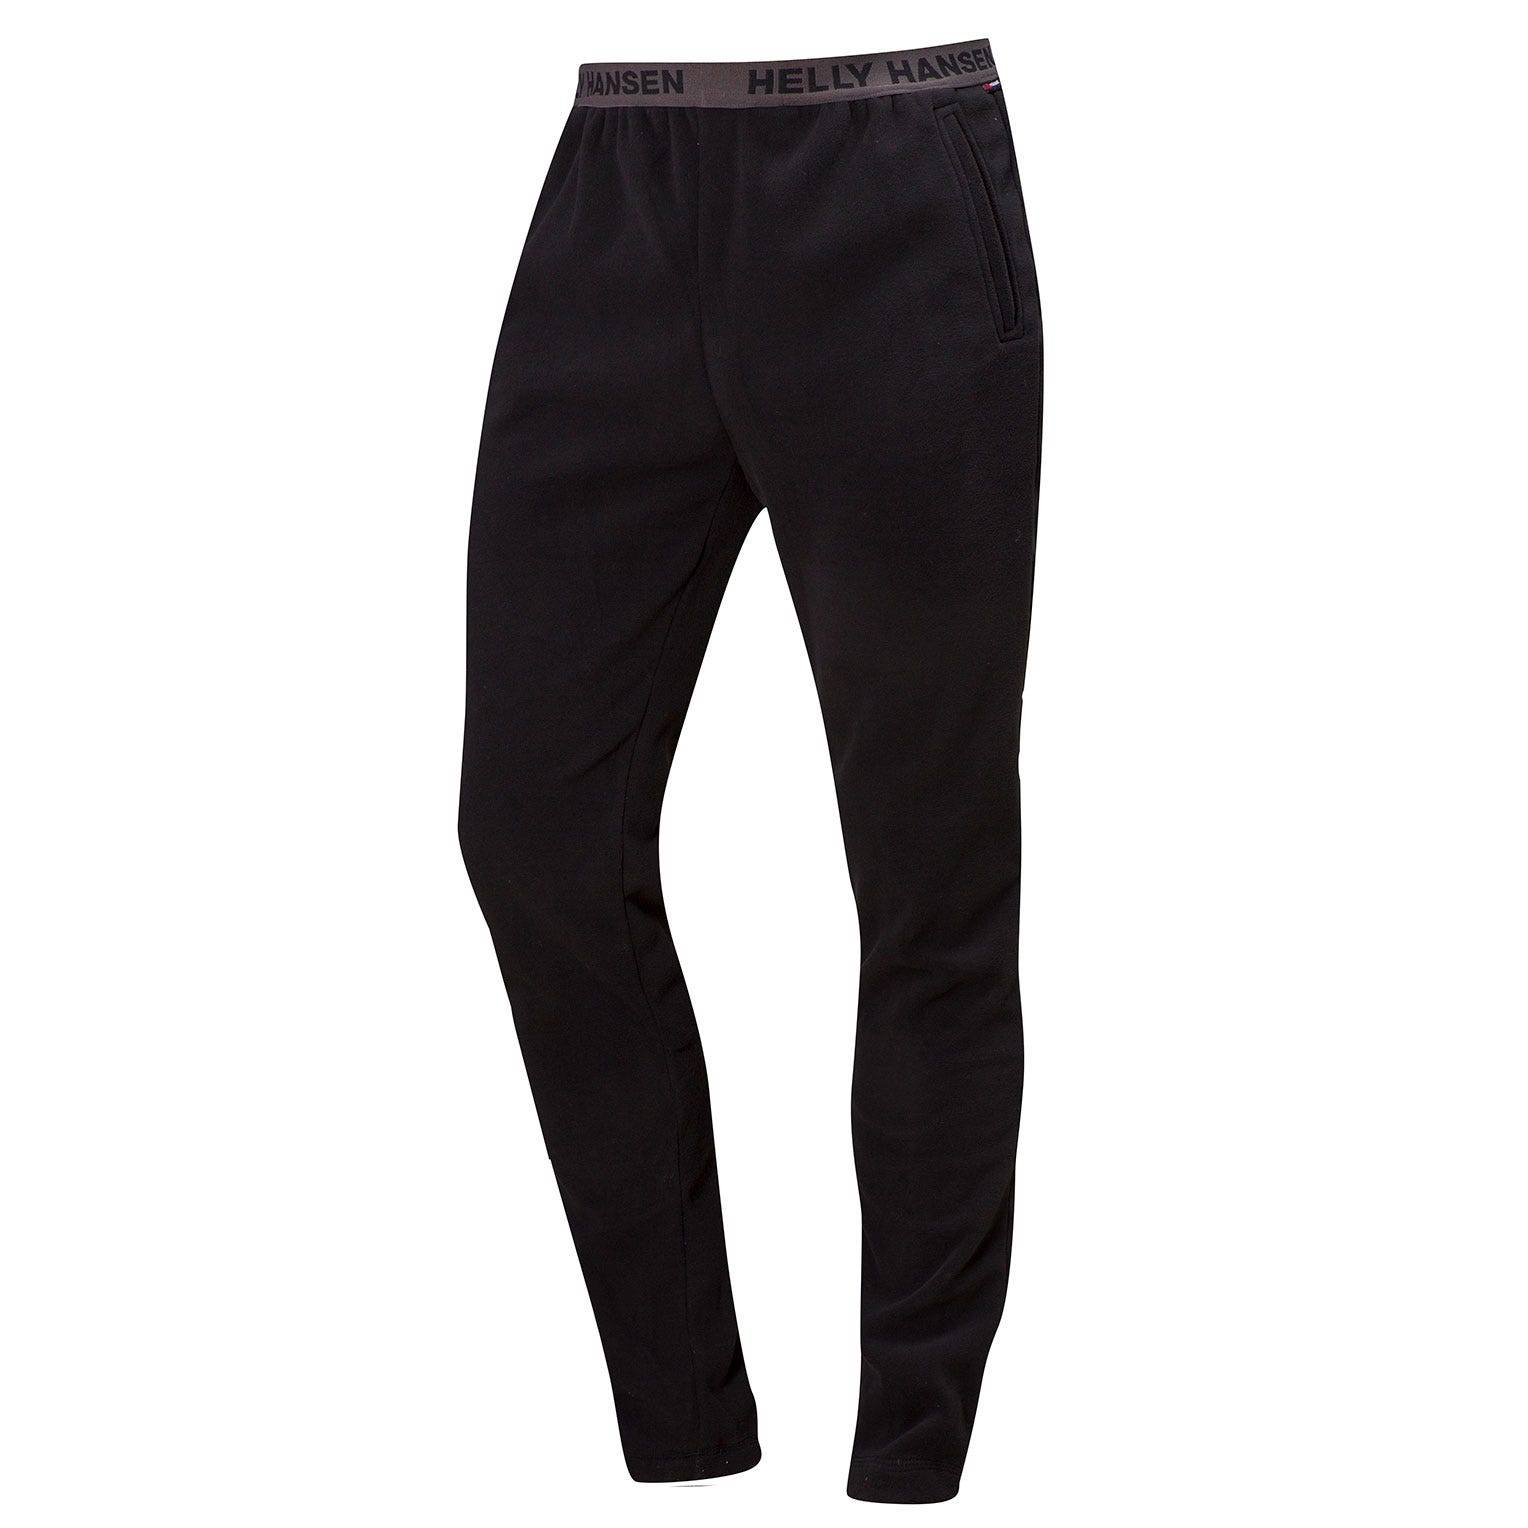 Helly Hansen Daybreaker Fleece Pant Mens Black XXL